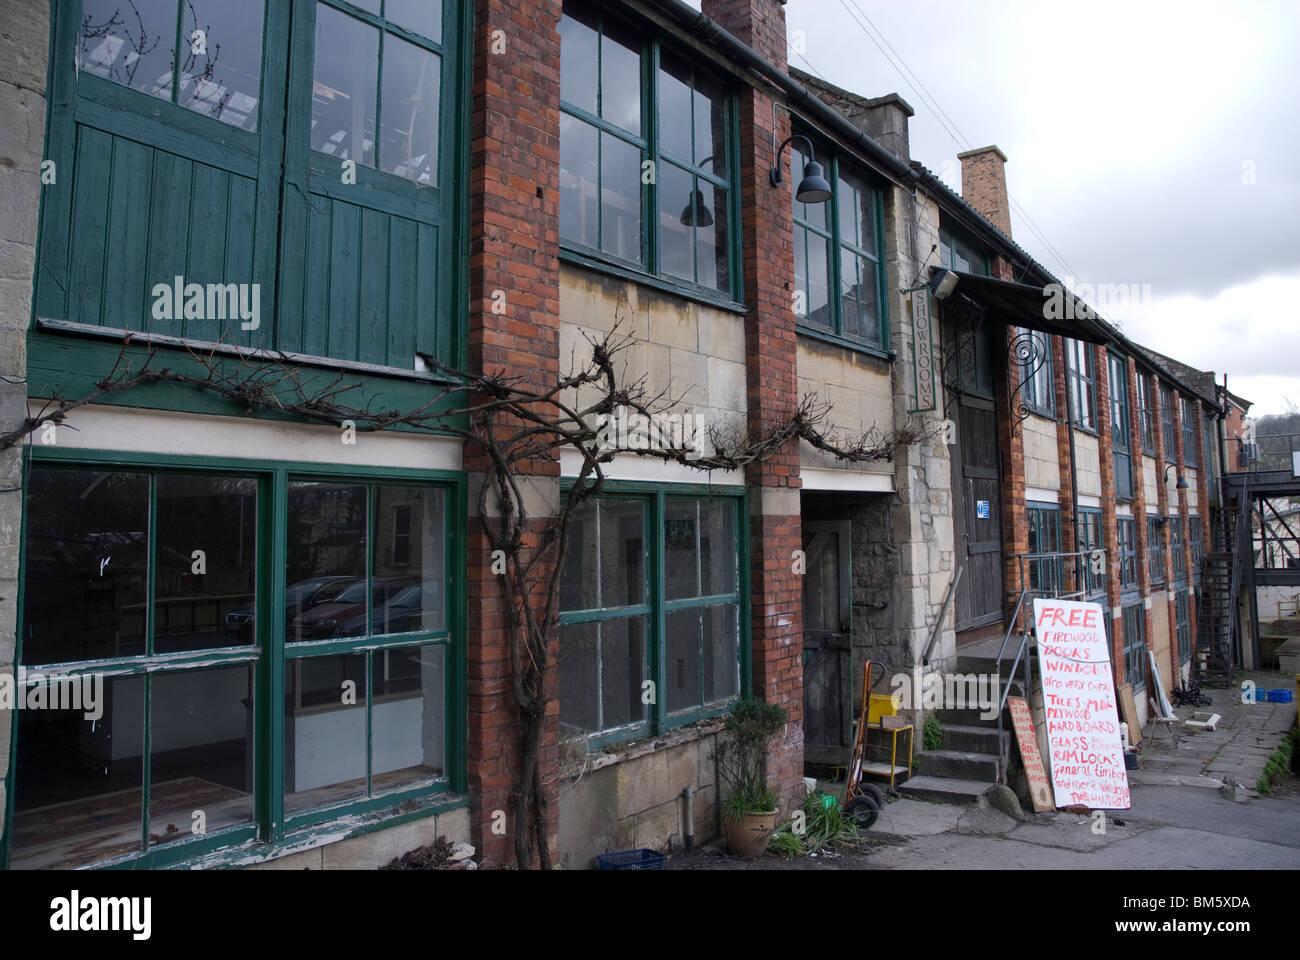 Walcot Reclamation Yard, Bath Spa, Somerset UK Stock Photo: 29634006 ...